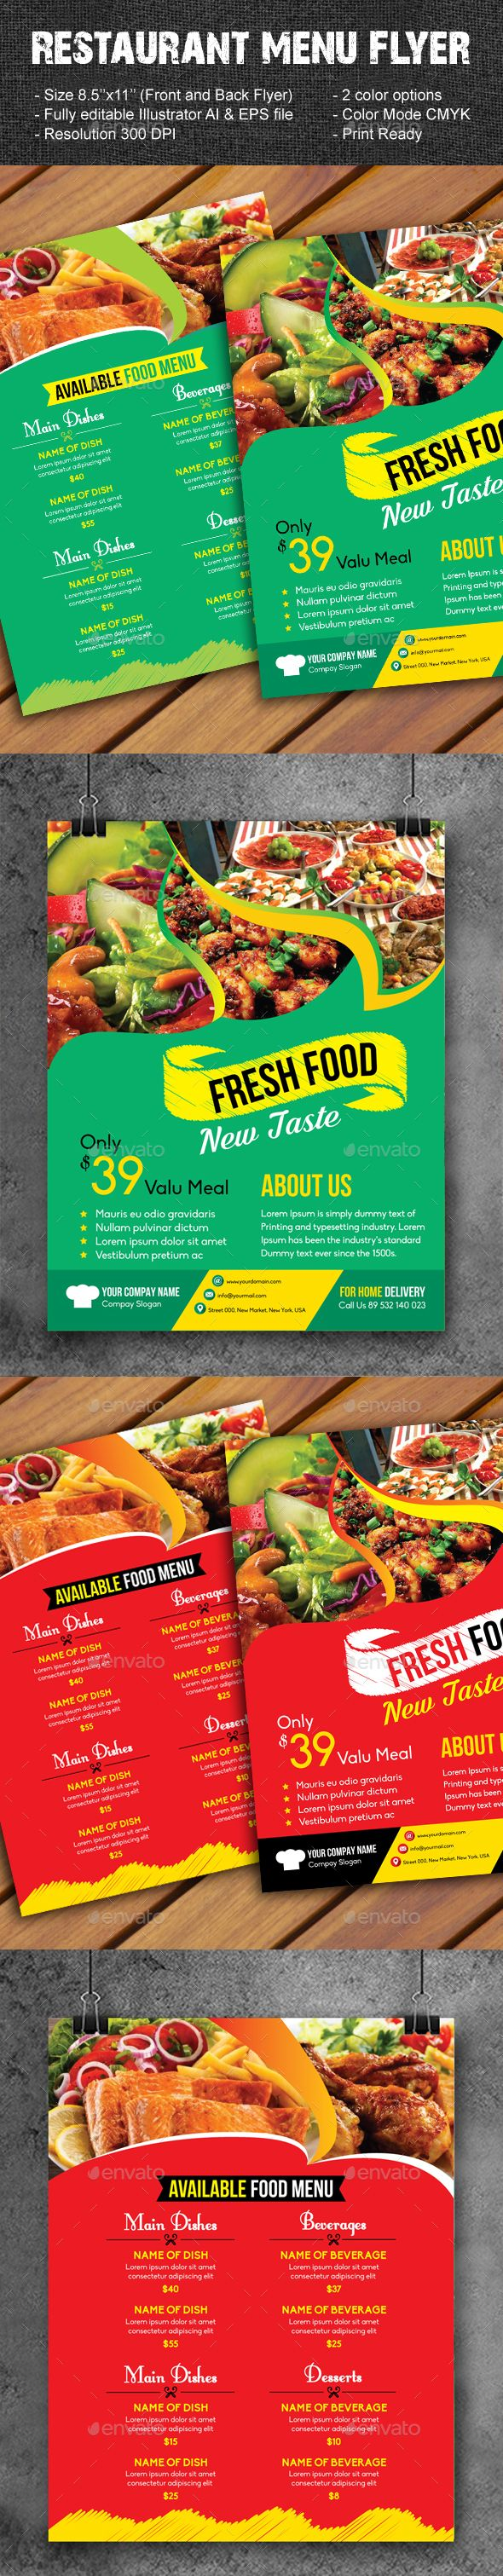 restaurant menu flyer pinterest